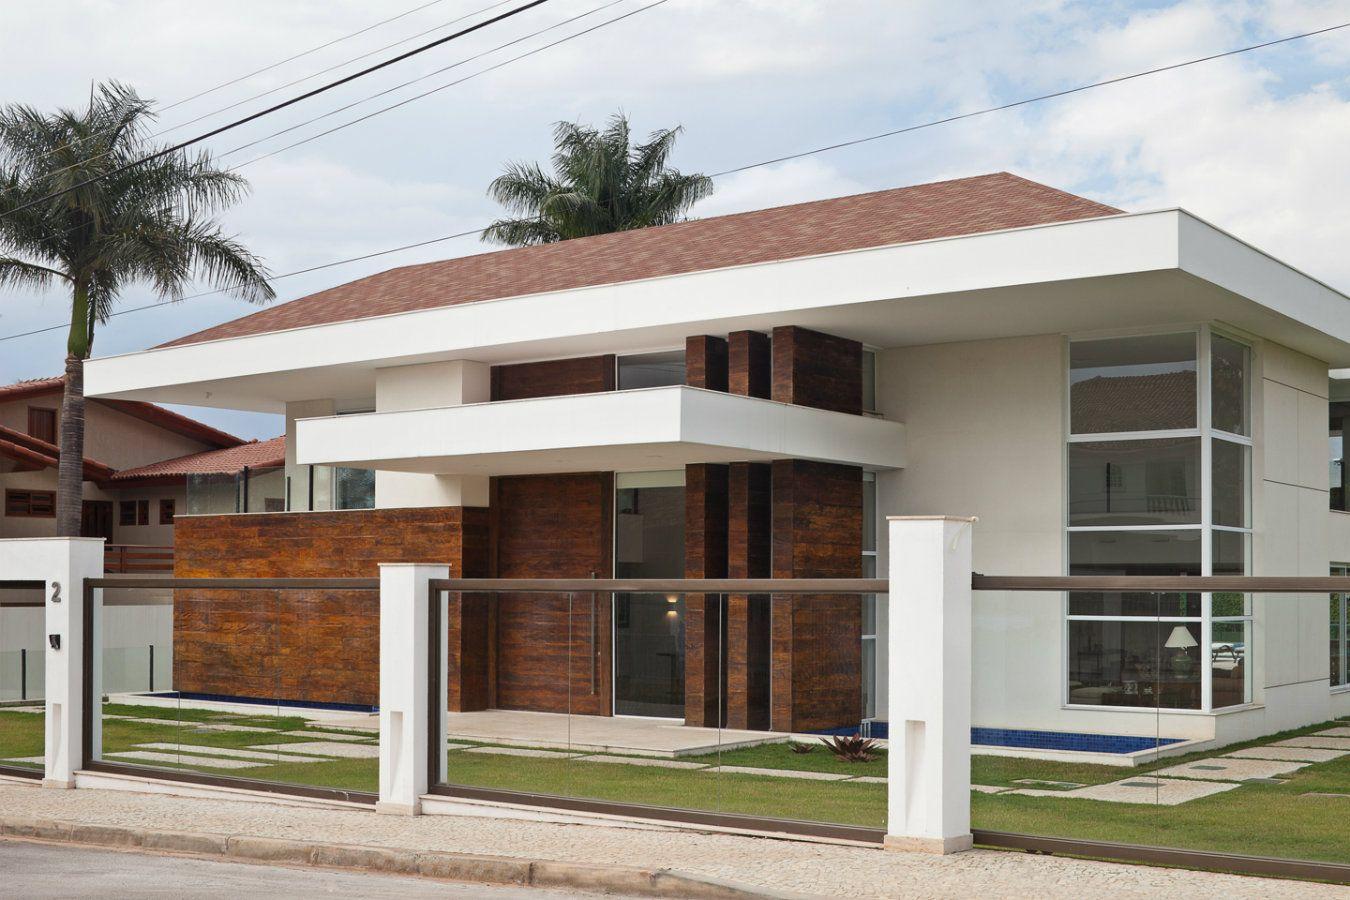 Fachadas de casas lindas e de diferentes estilos veja for Estilos de casas contemporaneas